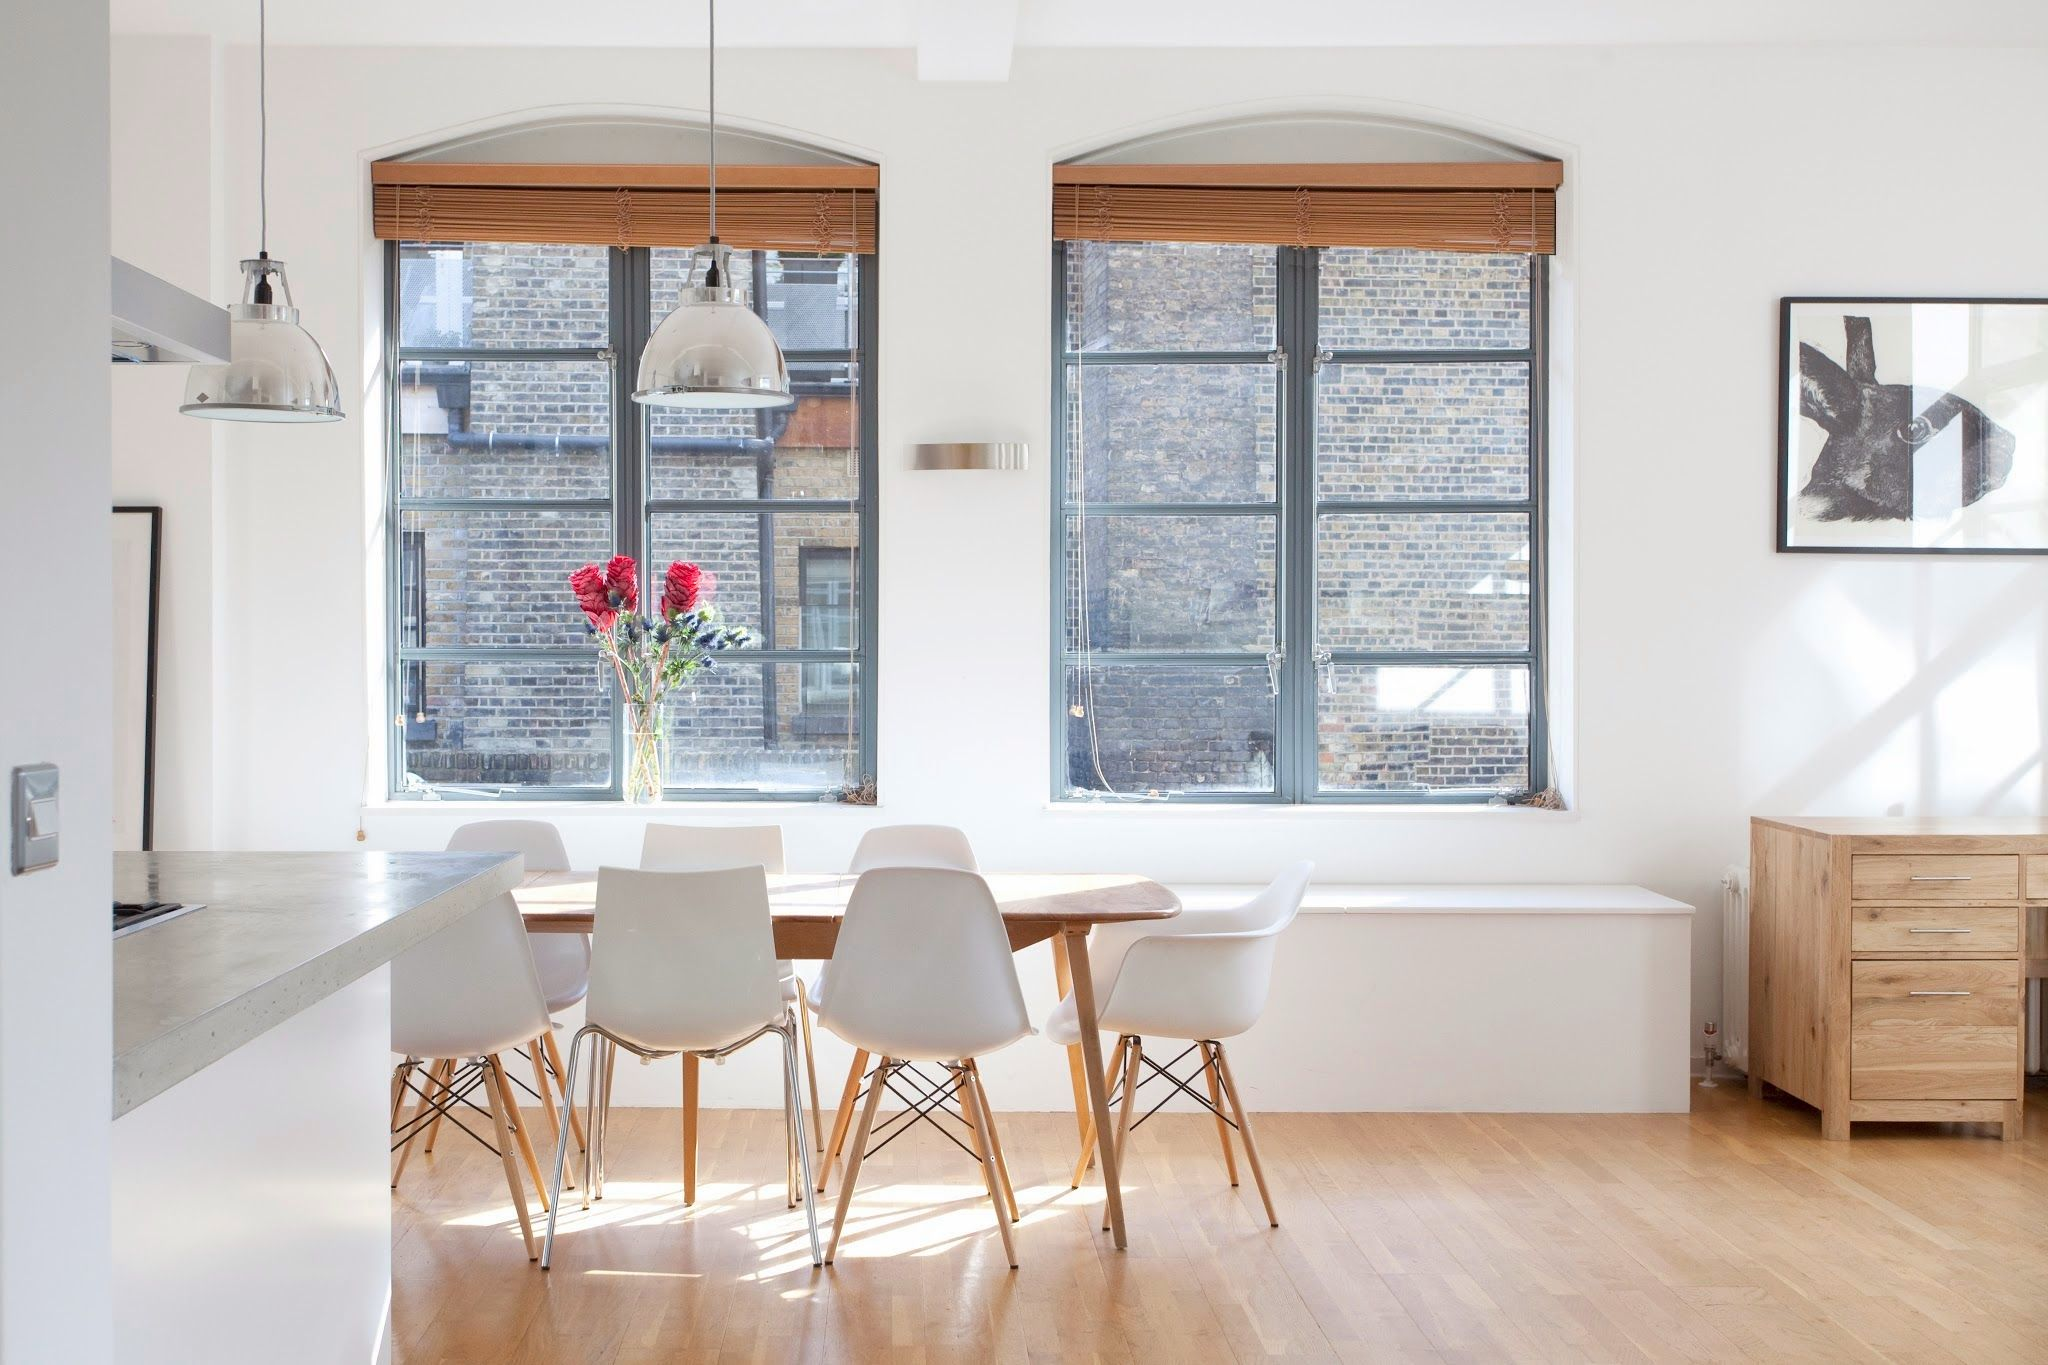 100 Kitchen Chairs Design Ideas. Industrial style in the modern interior